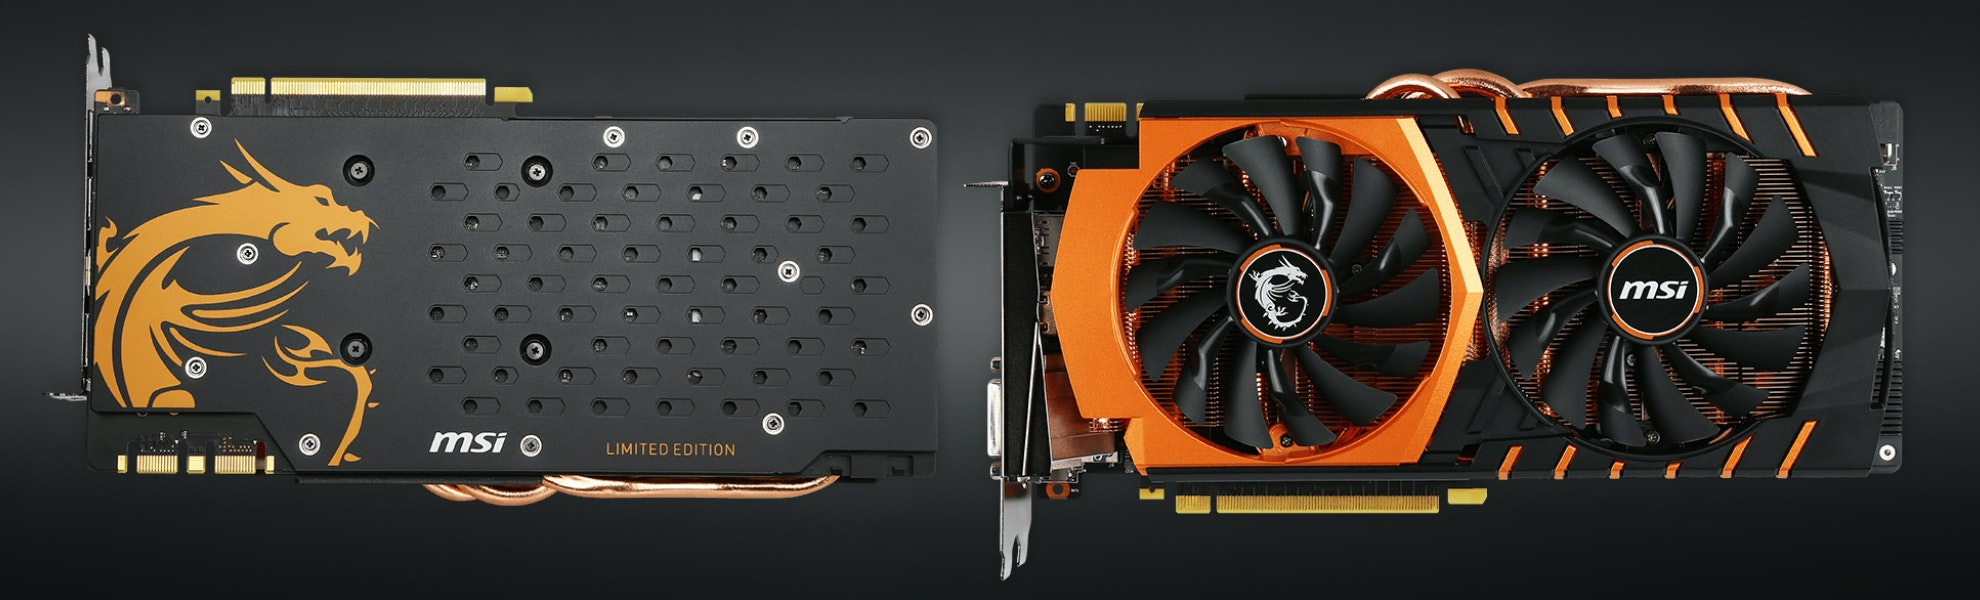 MSI GeForce GTX 980Ti Gaming 6G Golden Edition